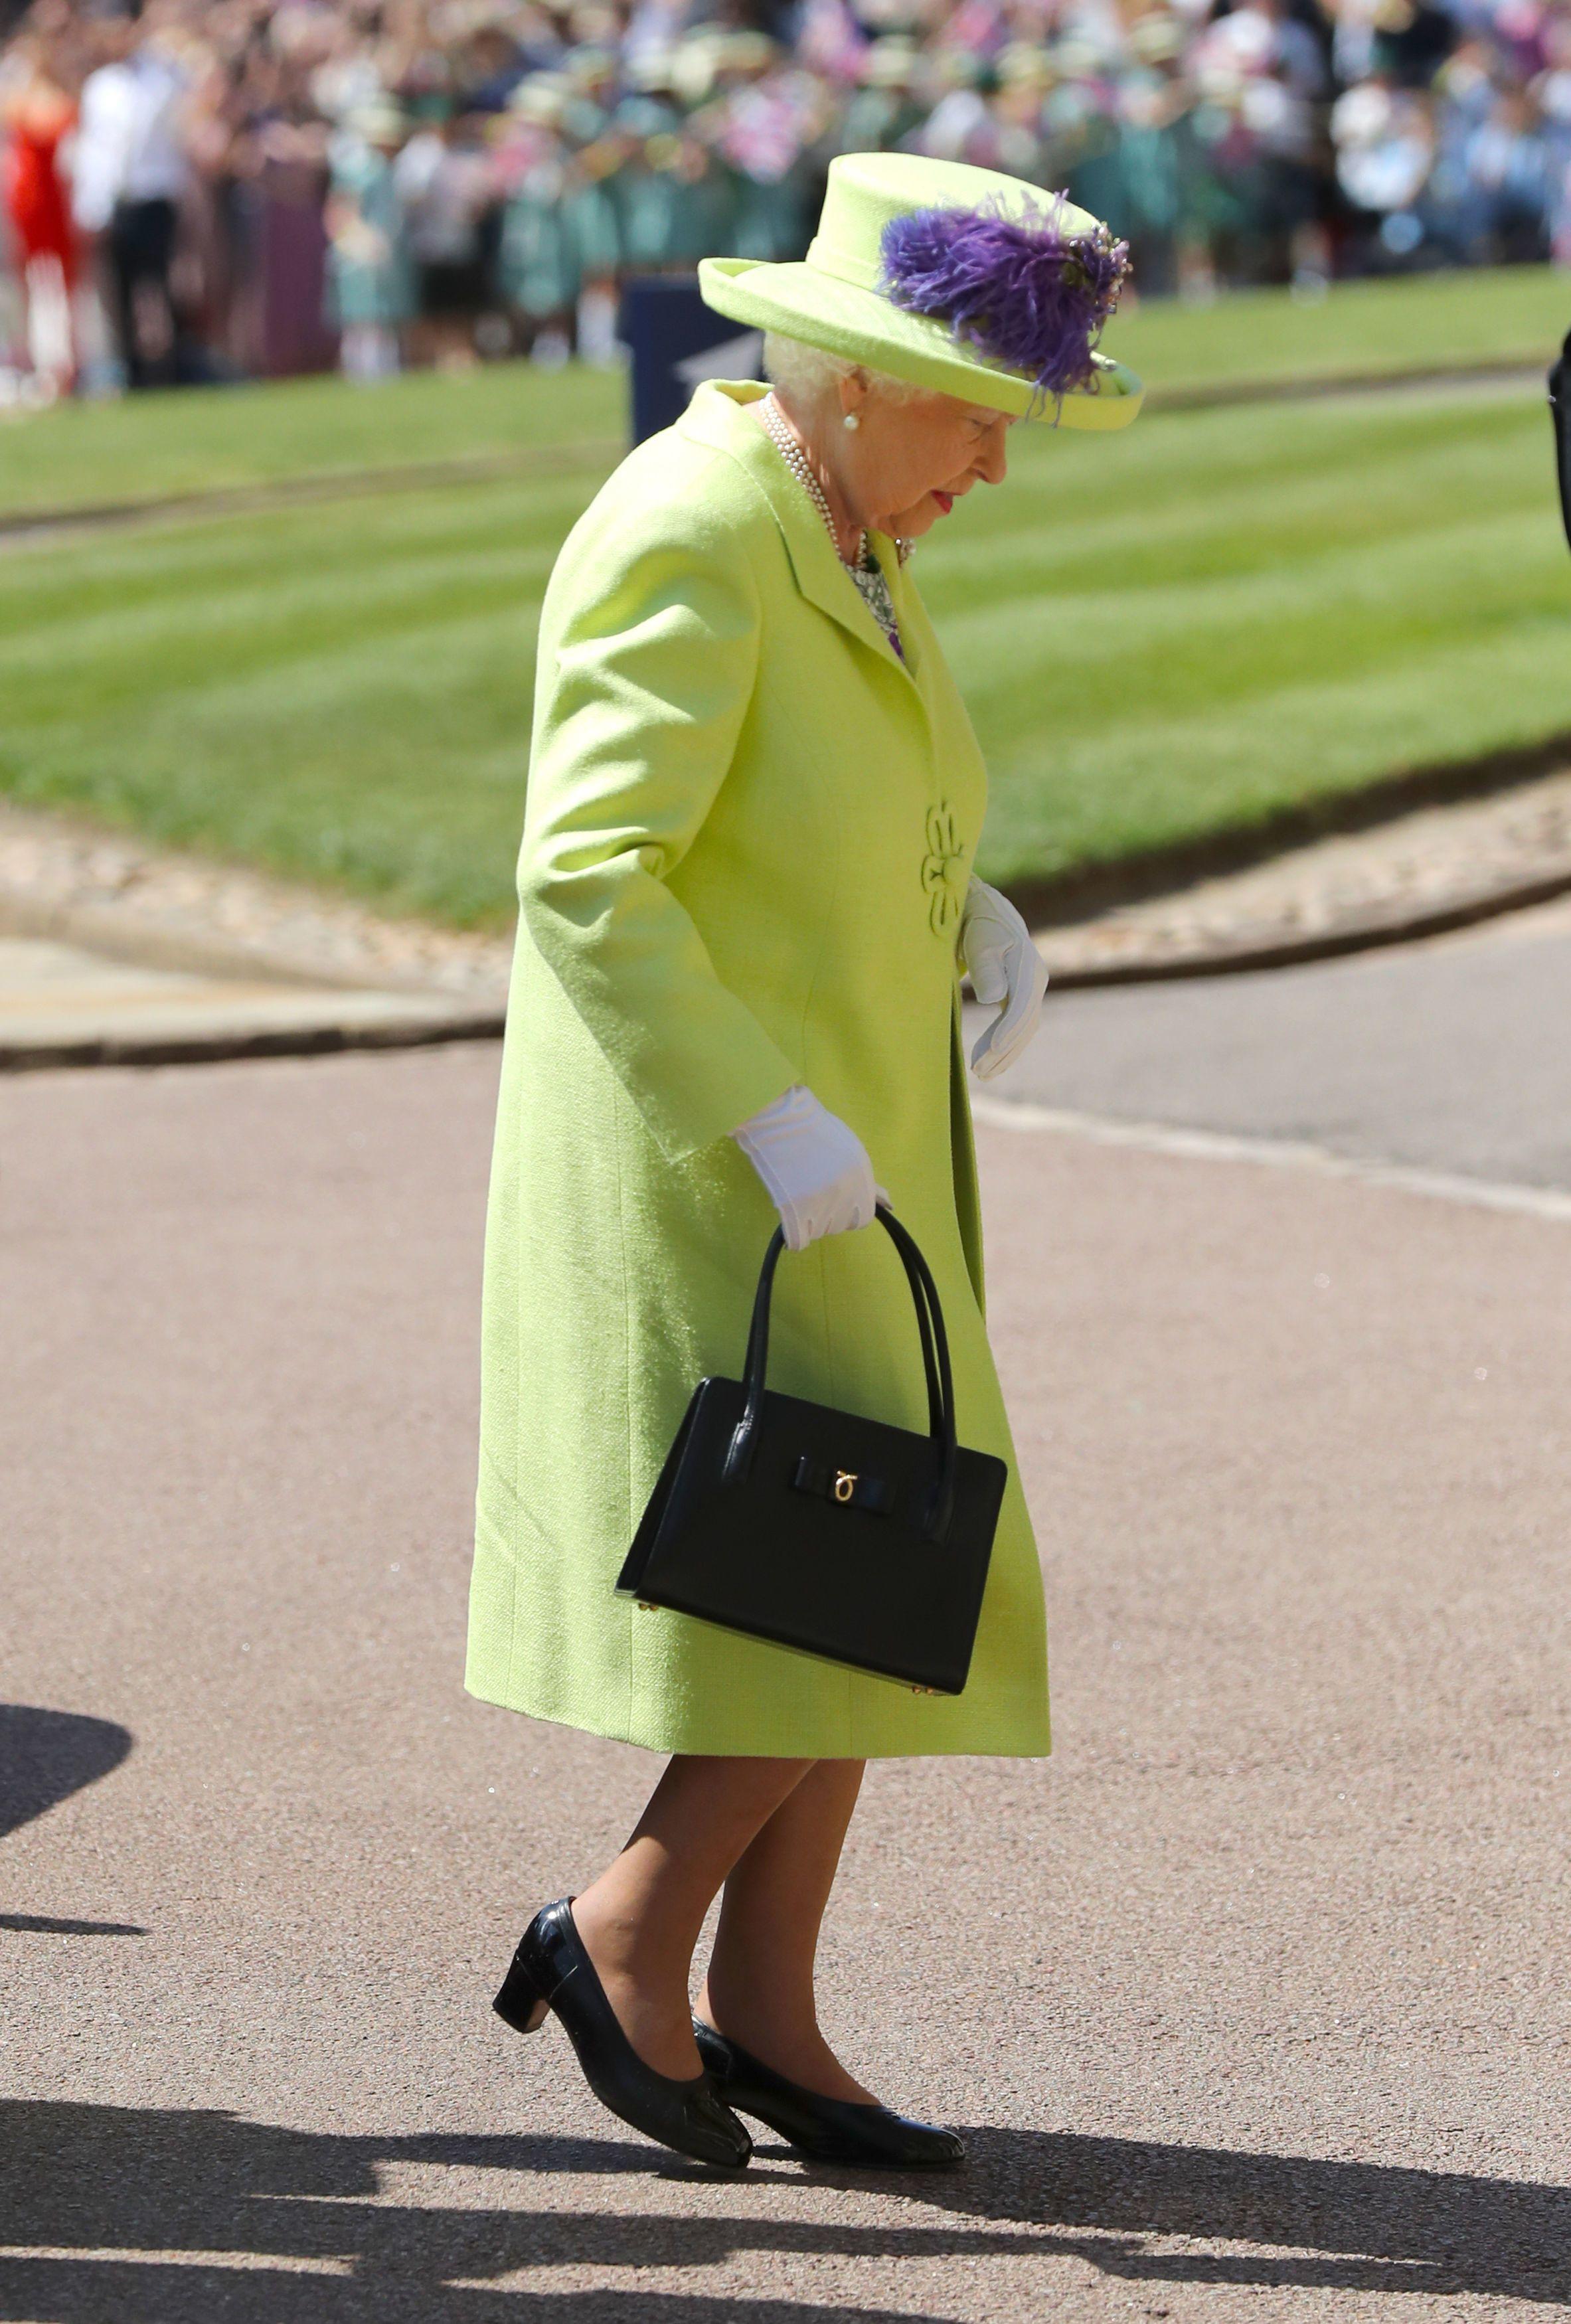 https://hips.hearstapps.com/hmg-prod.s3.amazonaws.com/images/royal-wedding-2018-queen-elizabeth-2-1526728458.jpg